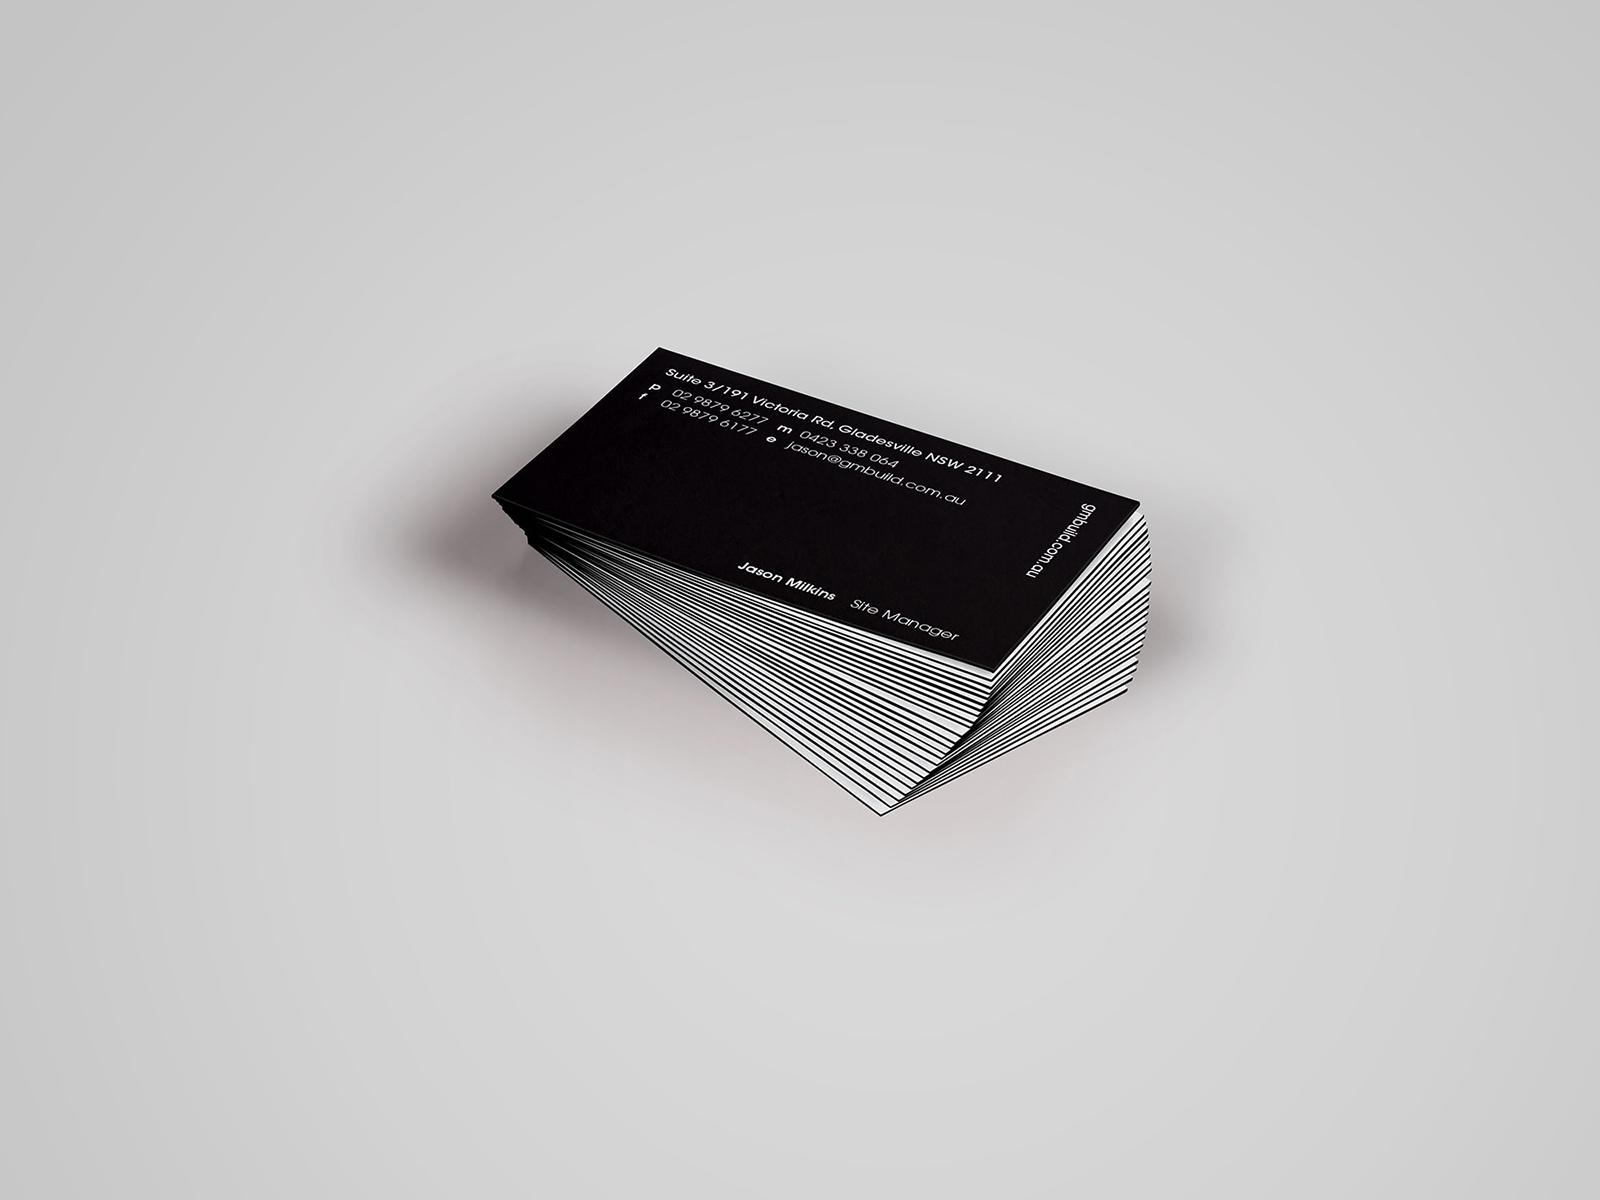 Card_greybg-min